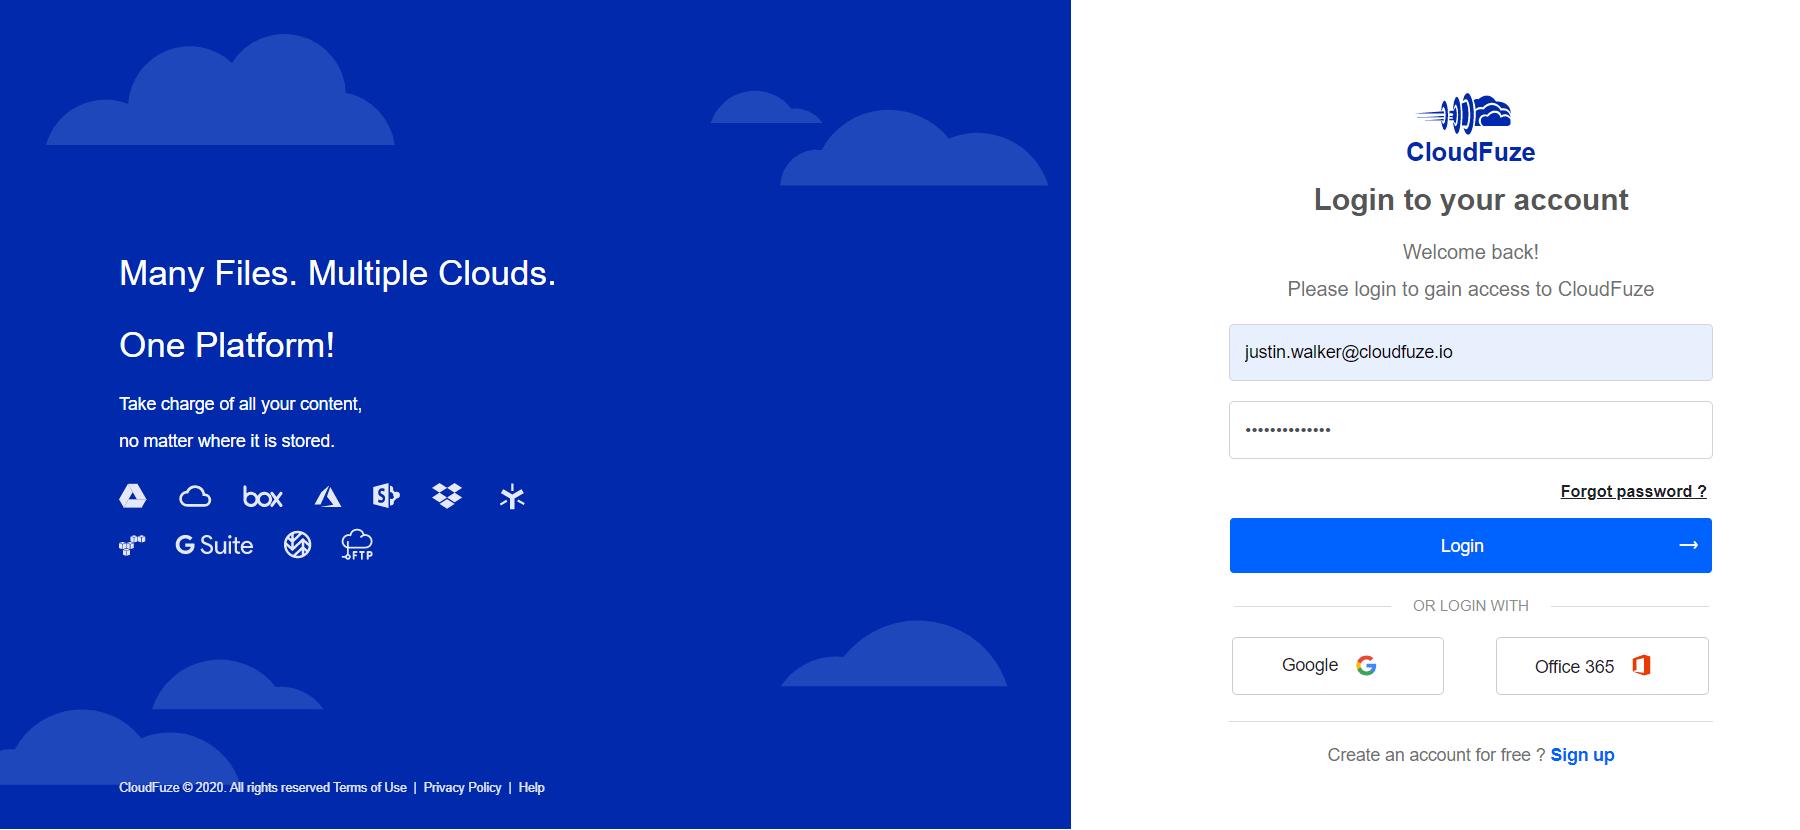 Login Credentials for webapp